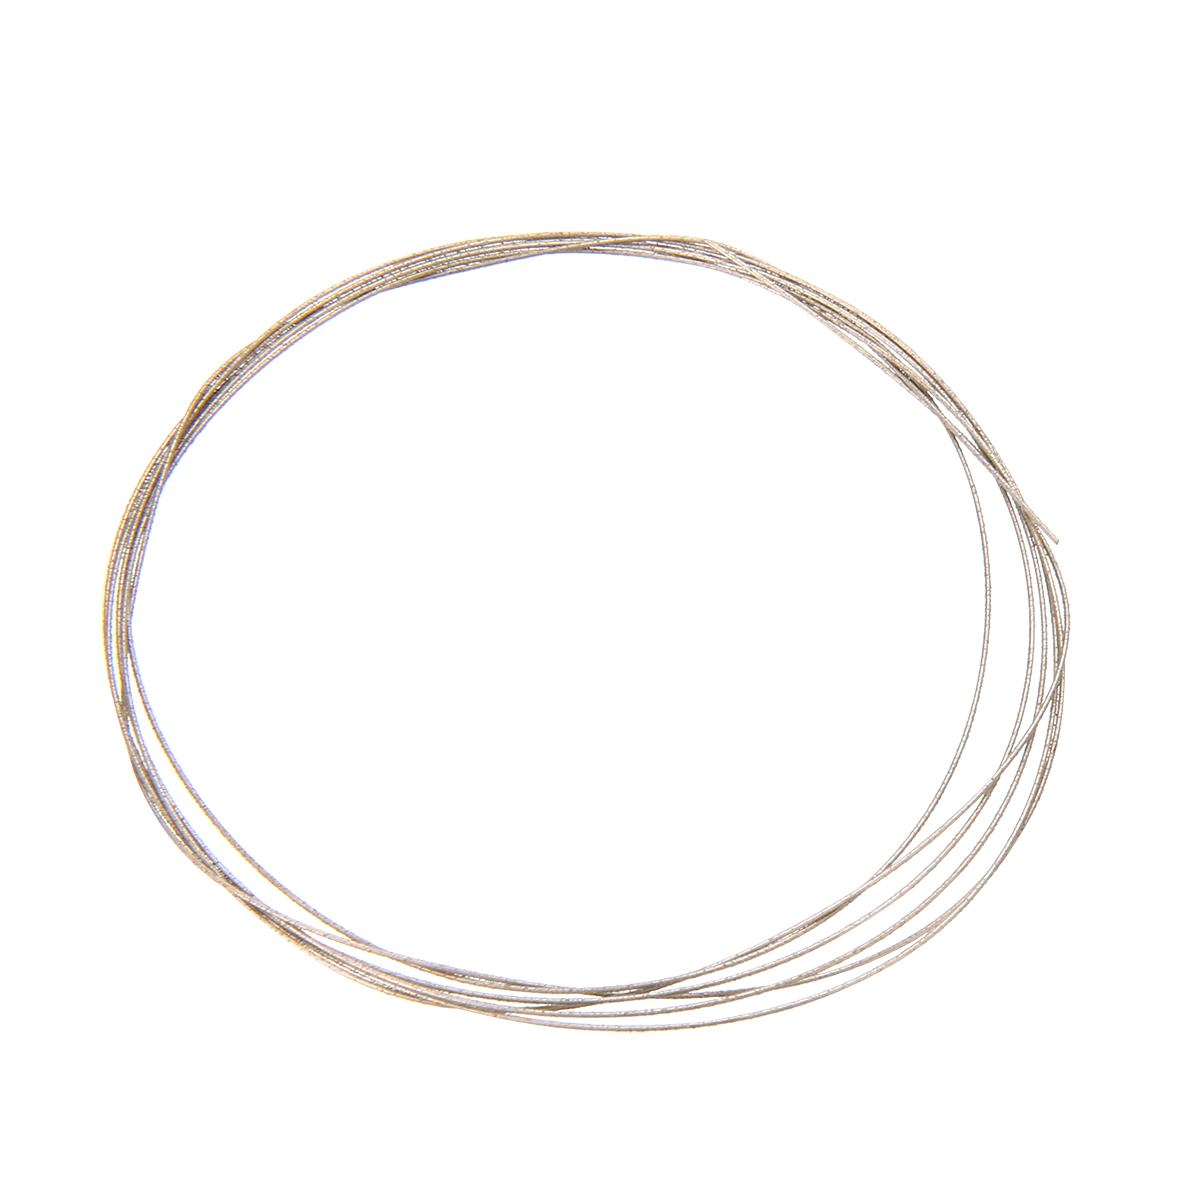 Durable Mayitr 1m Metal Wire Saw Blades 0.26/0.38mm Diamond Emery Jade Metal Glass Cutting DIY